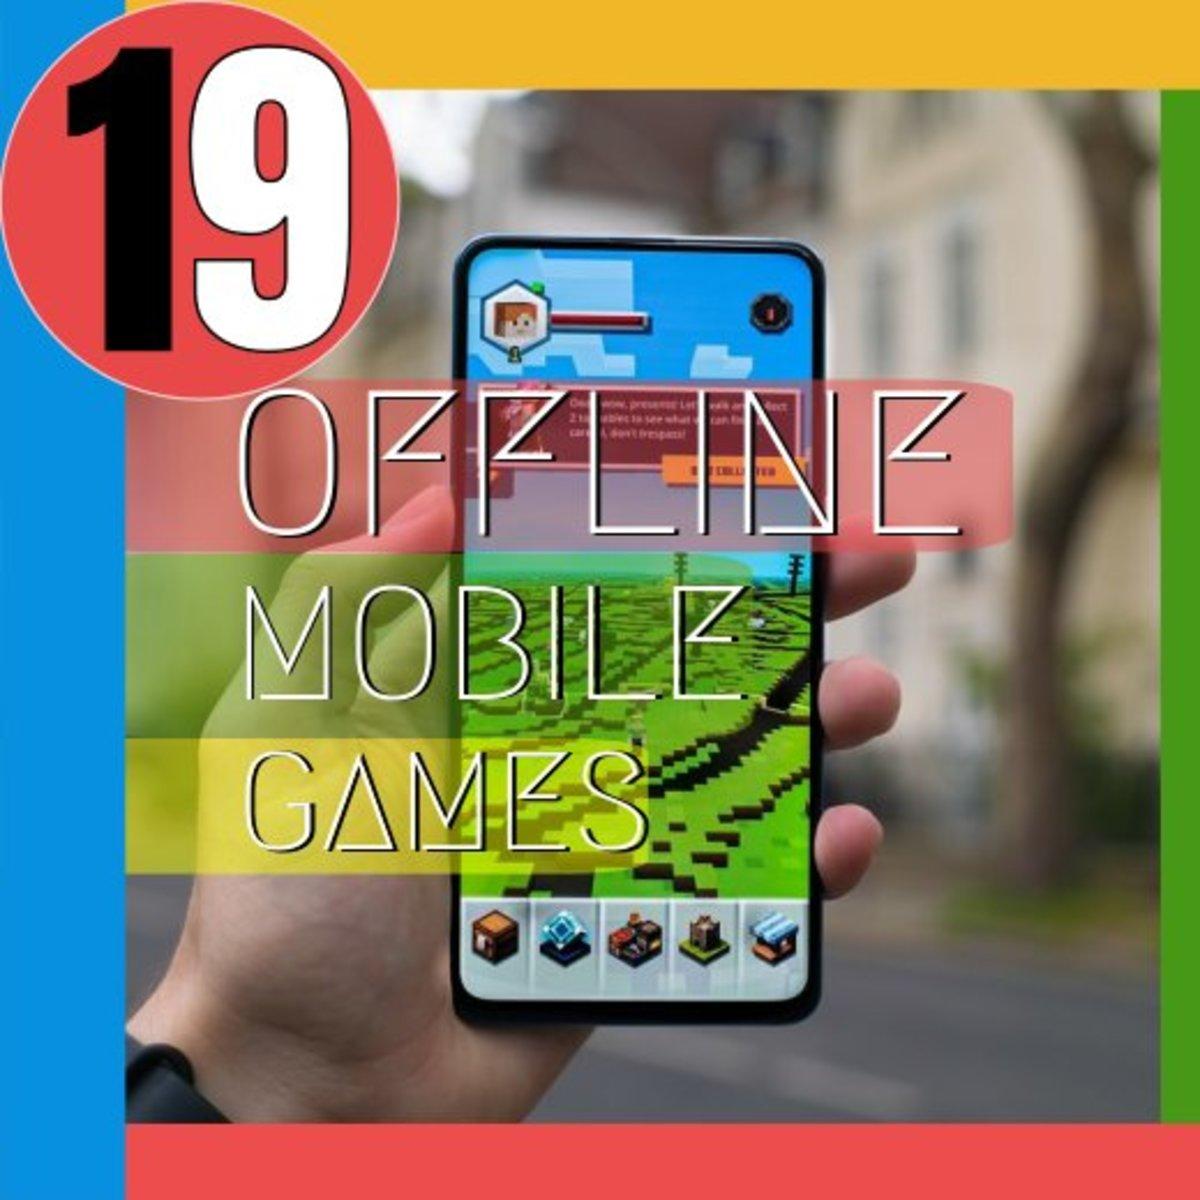 19 Best Offline Mobile Games for Bored People